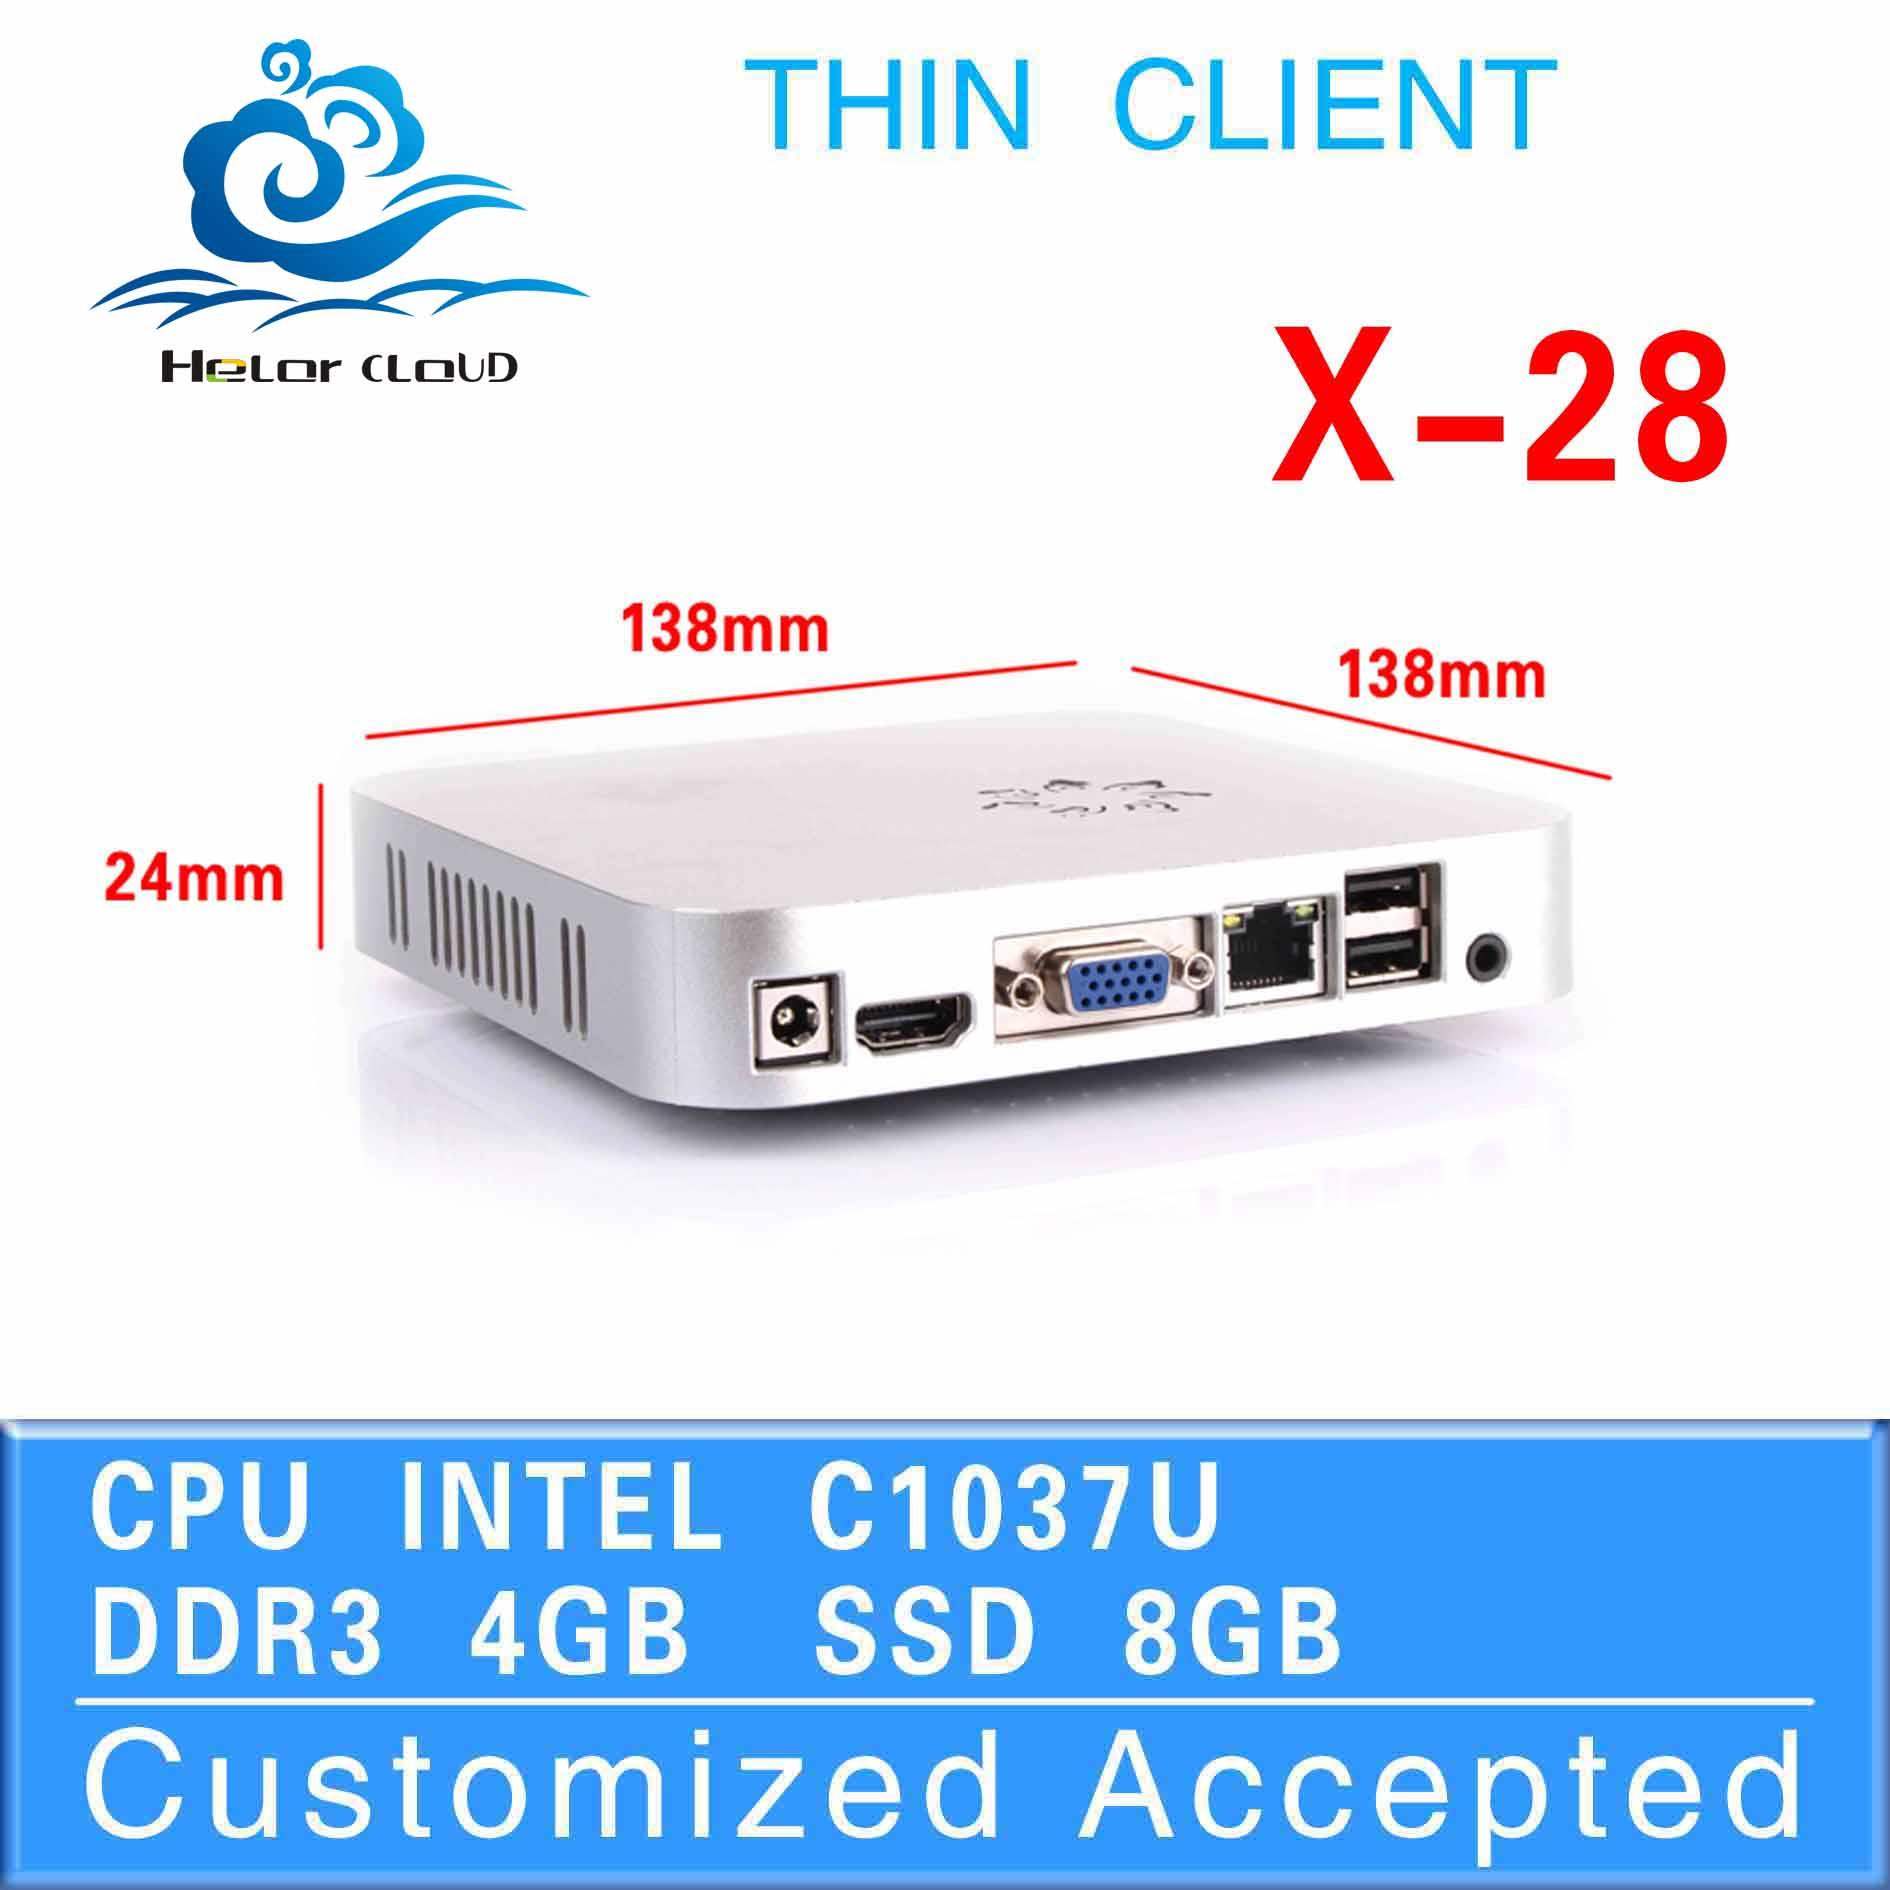 Ultra-low-power pc station x-28 1037u dual core fan embedded motherboard office pc 4g ram 8g ssd no noise low heat thin client <br>